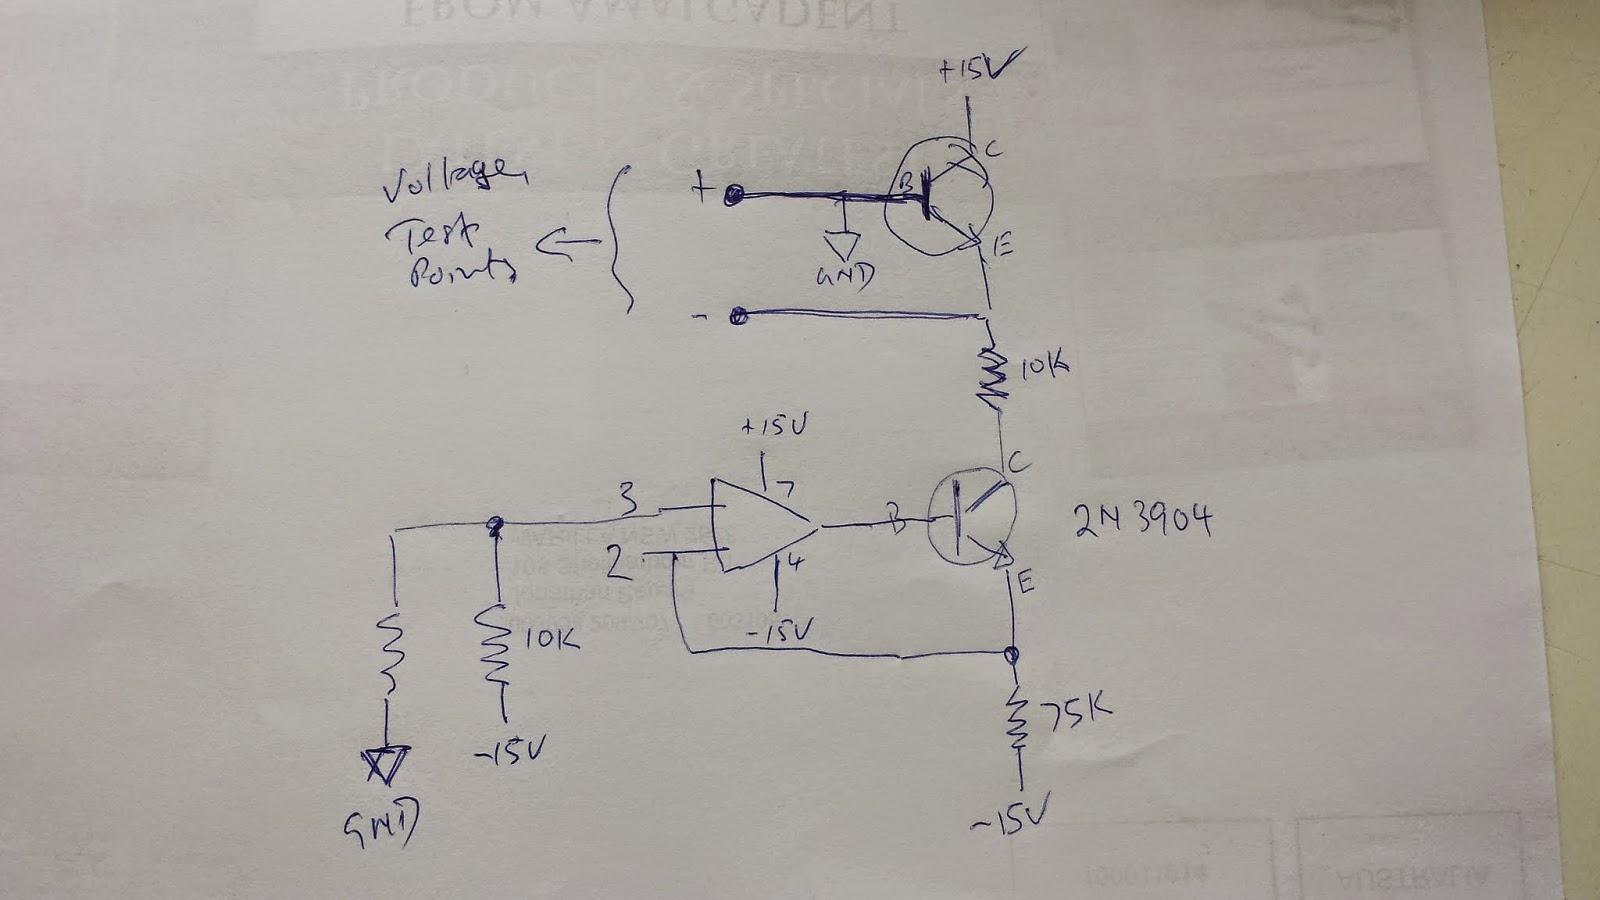 741 Chip Diagram Of Free Download Wiring Diagram Schematic